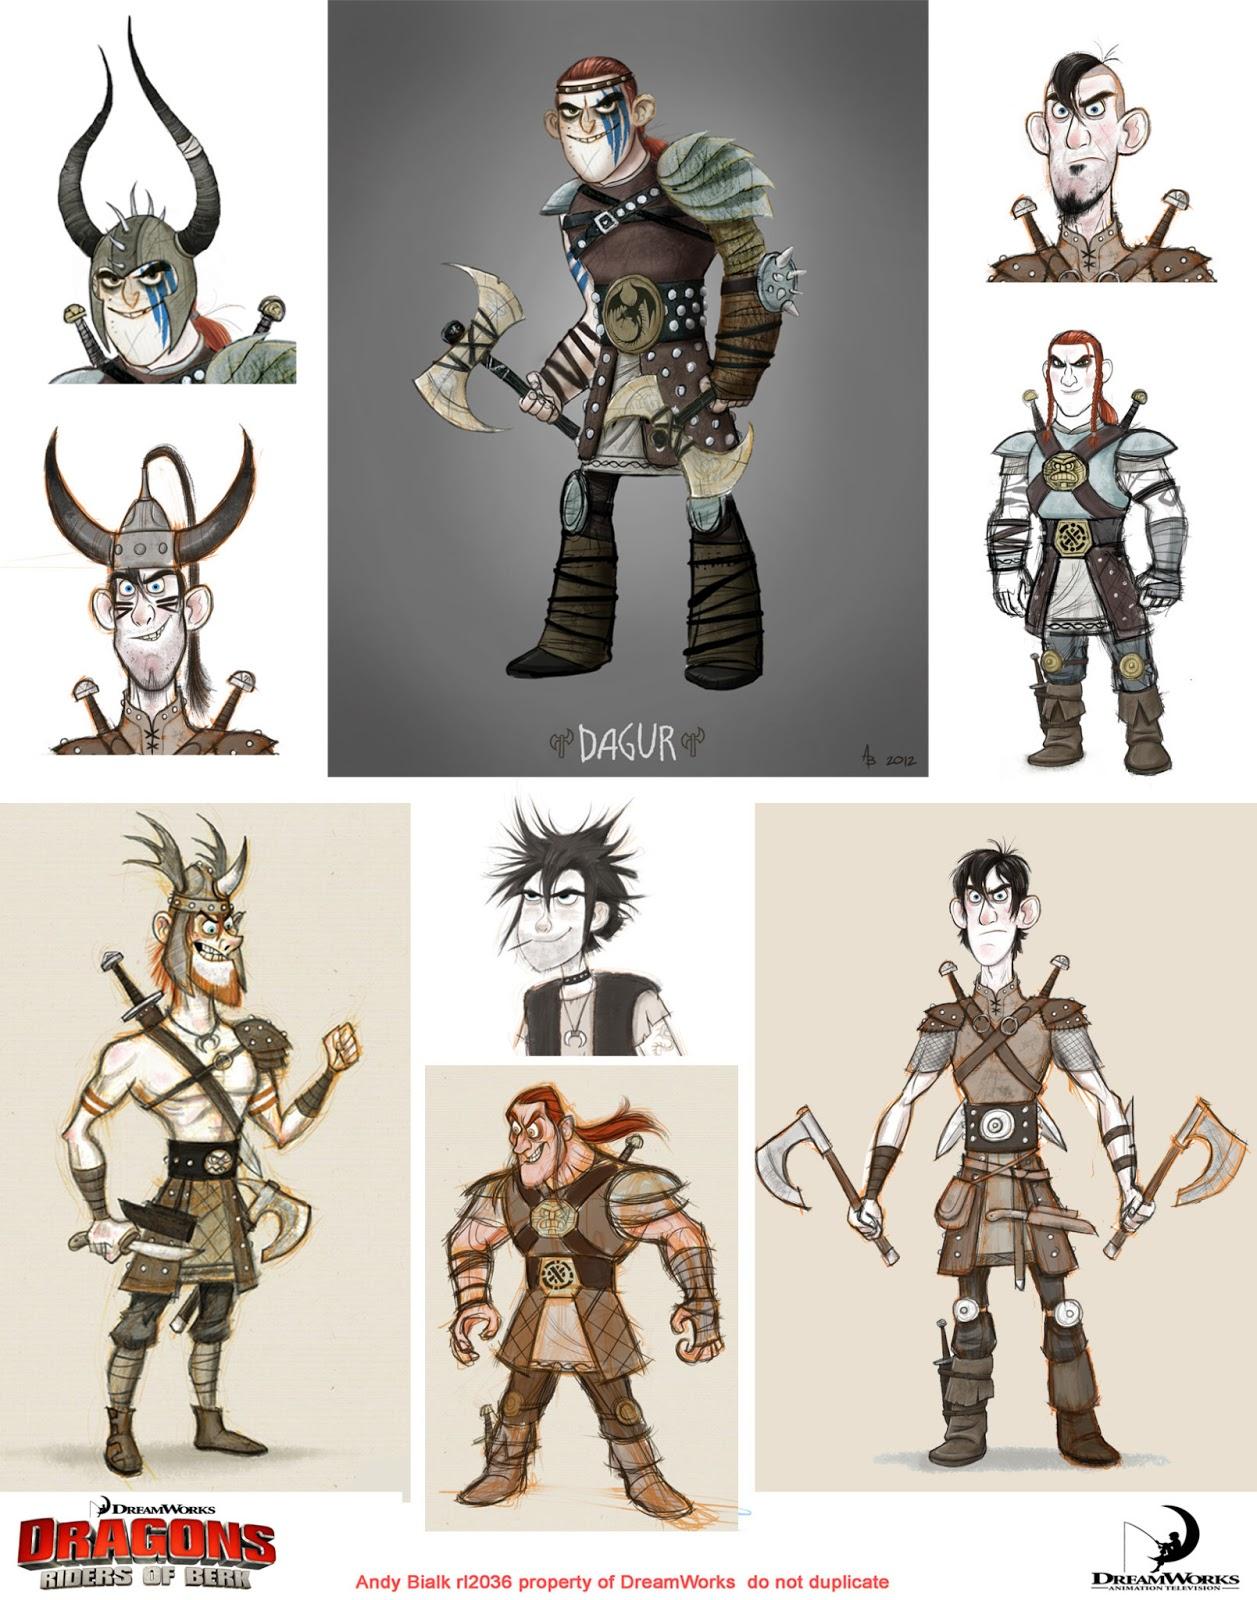 Character Design Dreamworks : Dreamworks quot dragons riders of berk